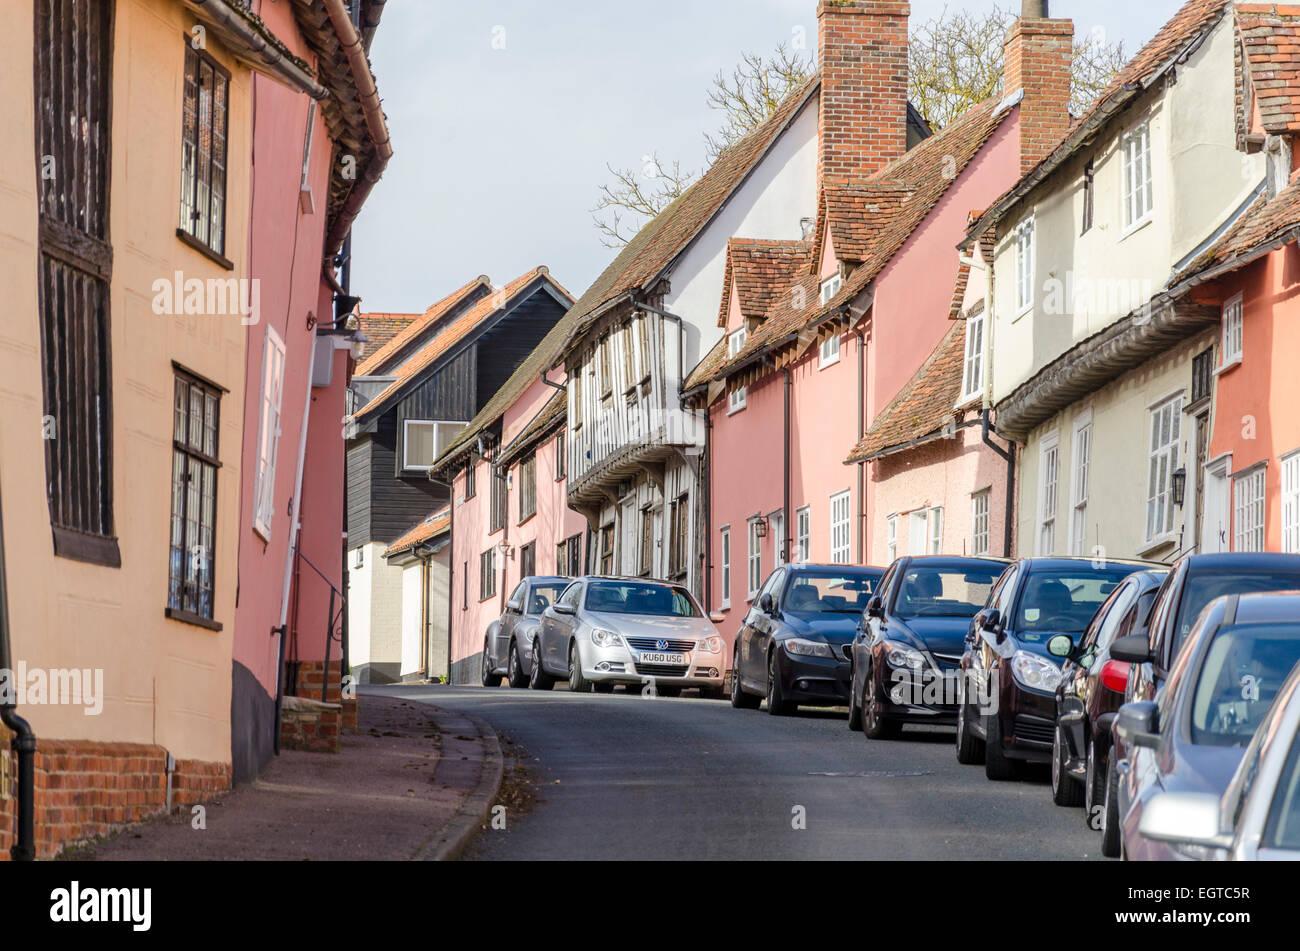 Lavenham, Sudbury, Suffolk, UK - Stock Image